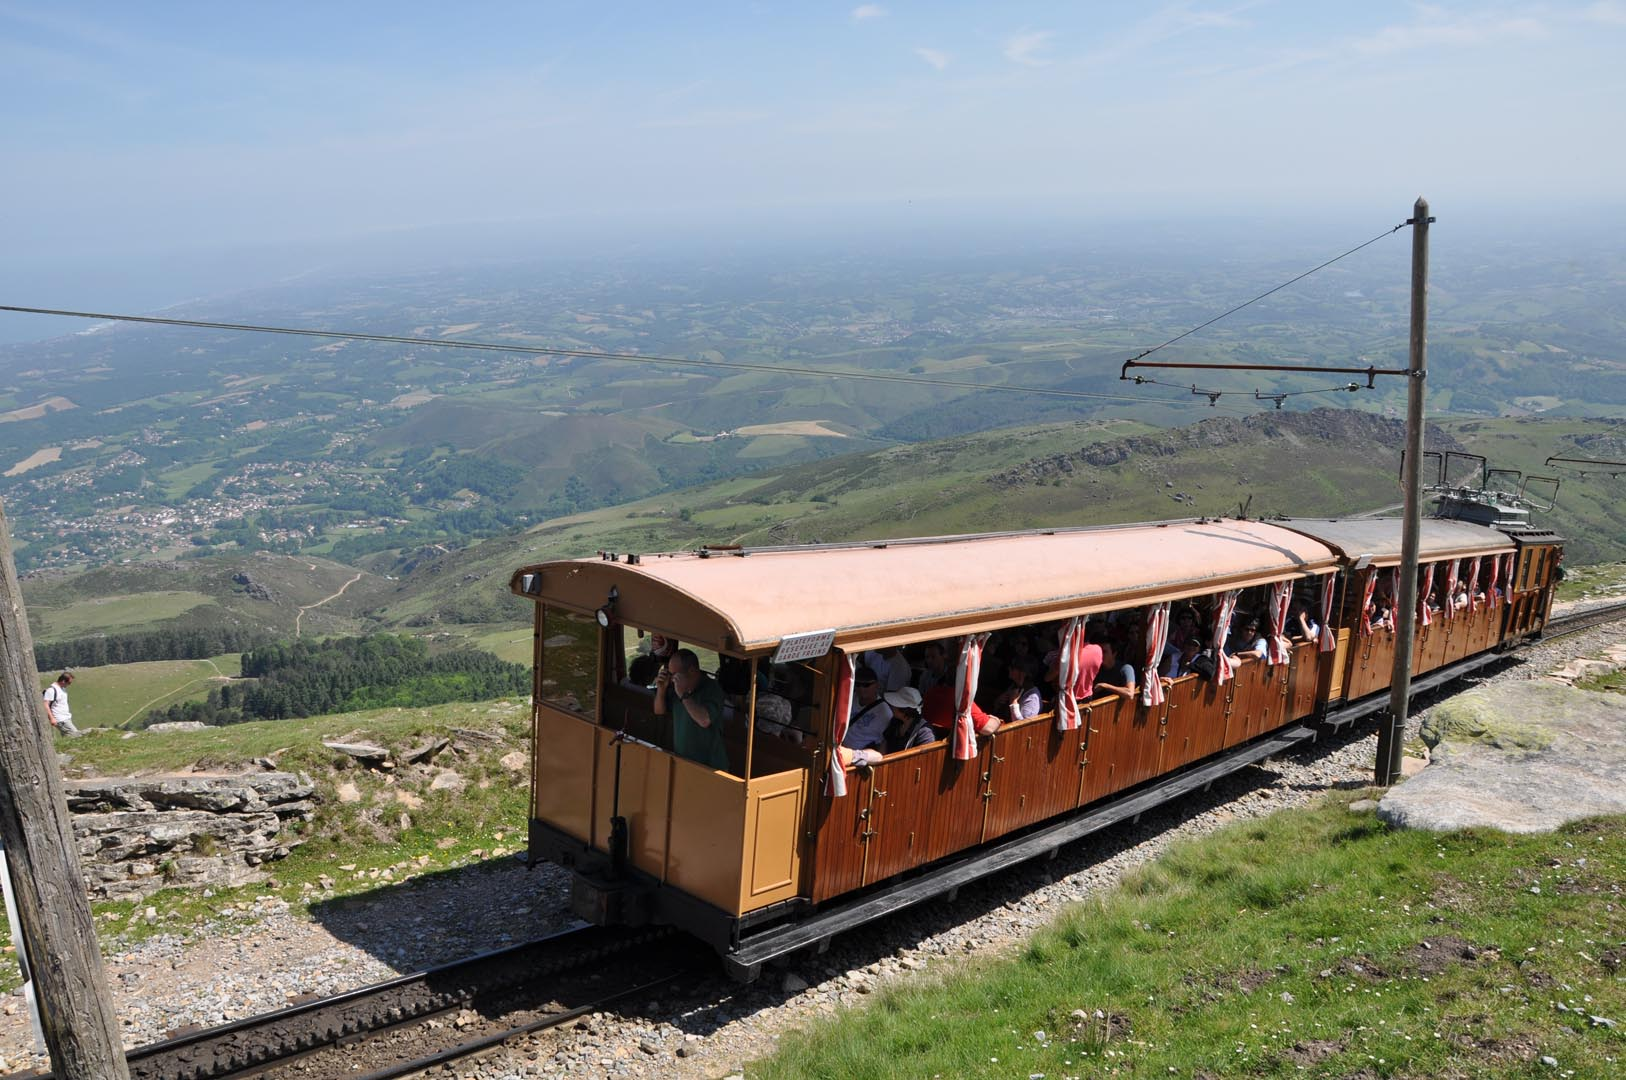 The little train of Rhune